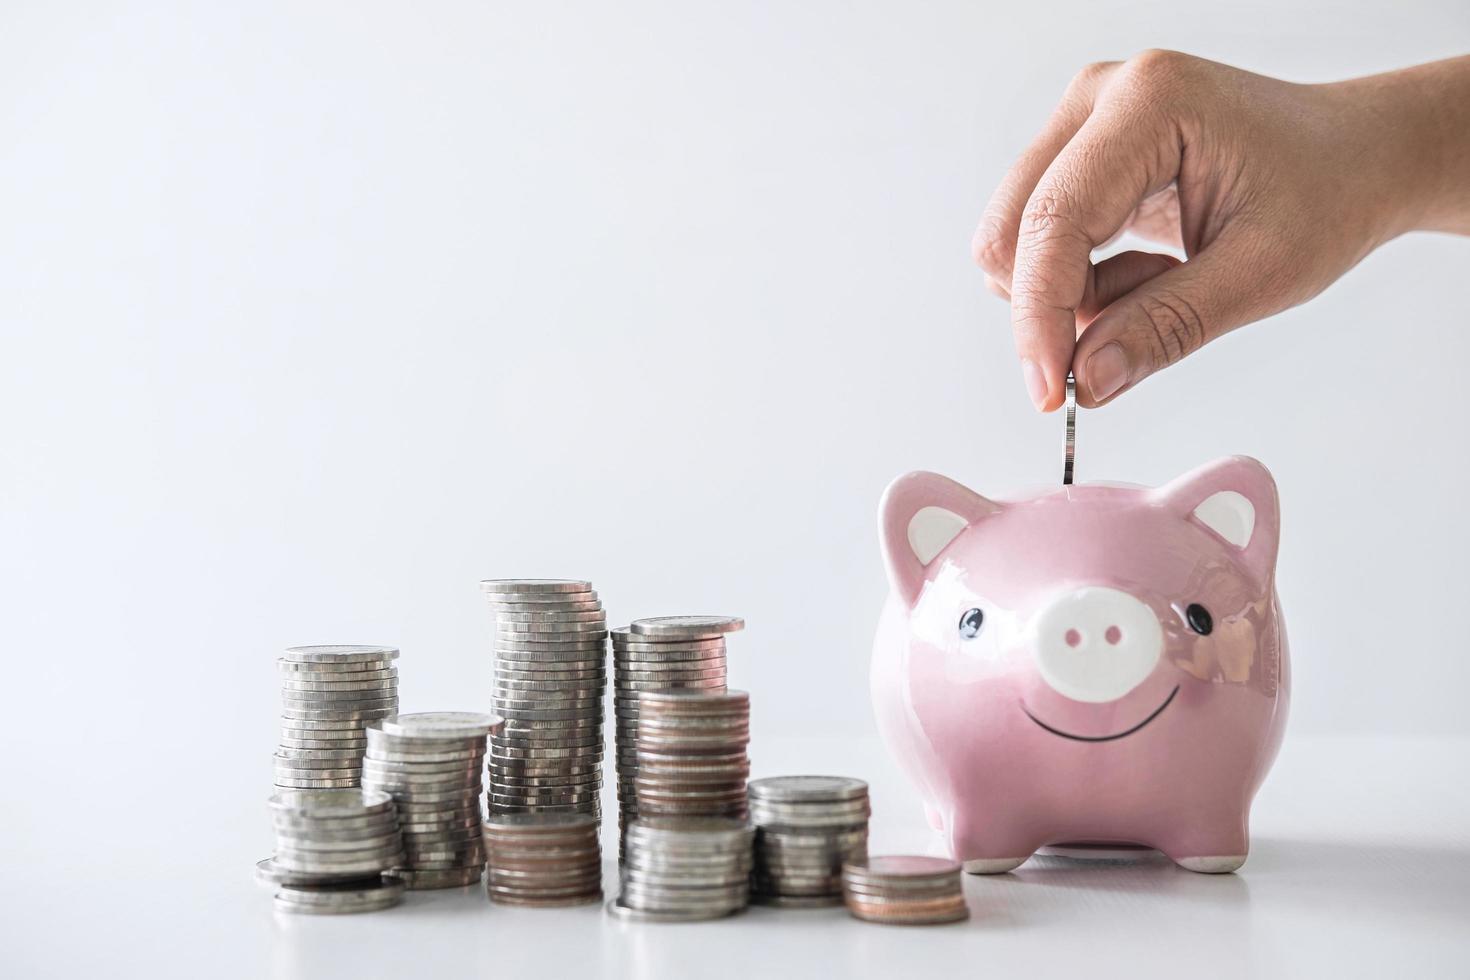 Close-up of hand putting money into piggy bank photo